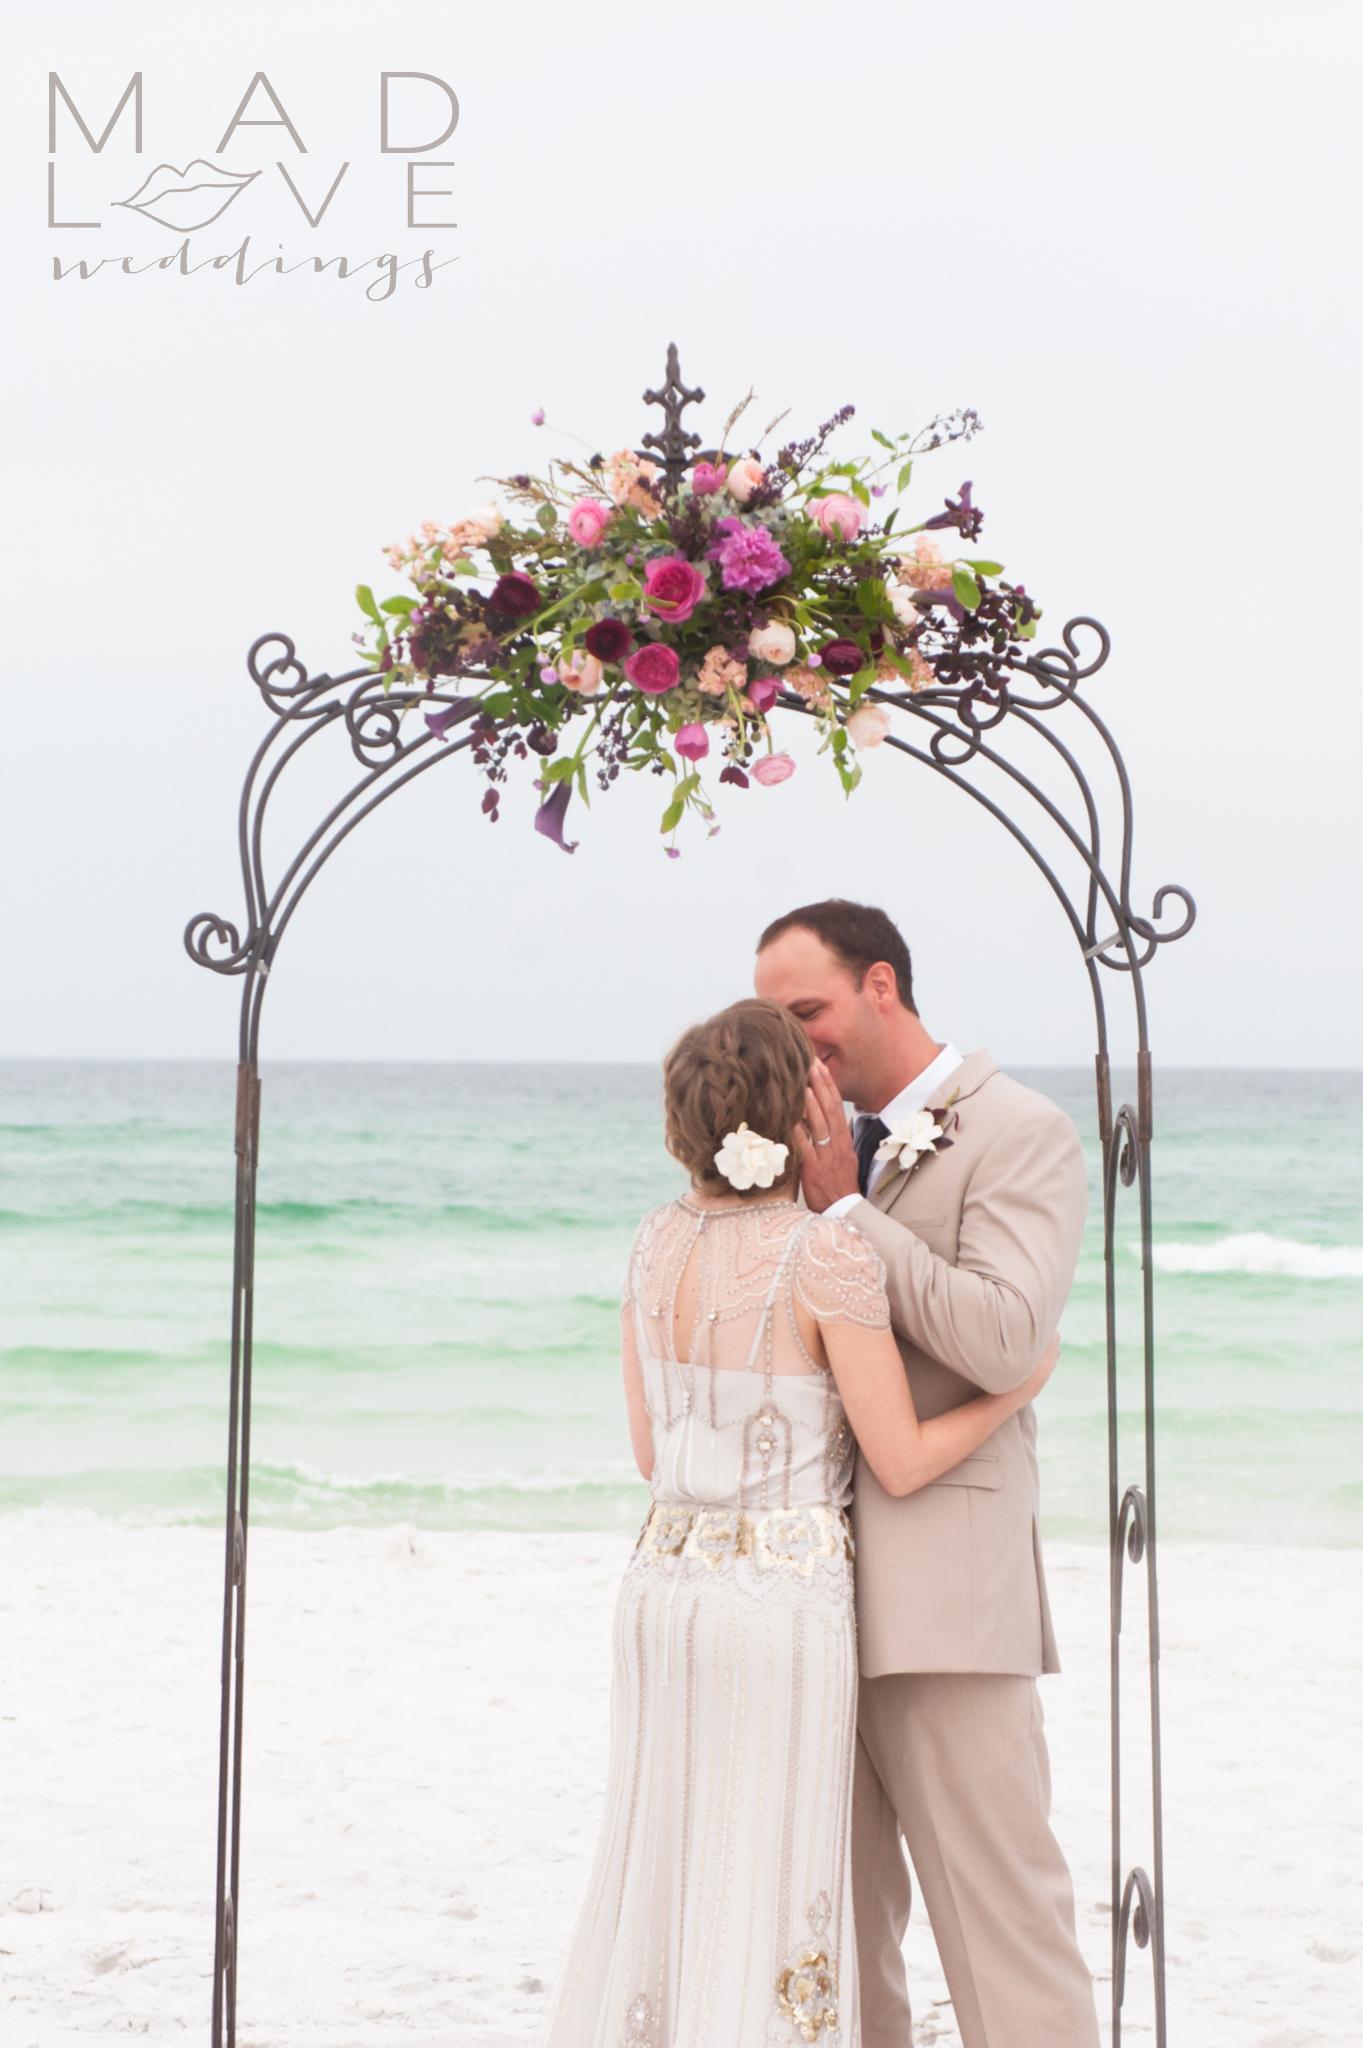 Fran & Jason- Mad Love Weddings-FB-37.jpg